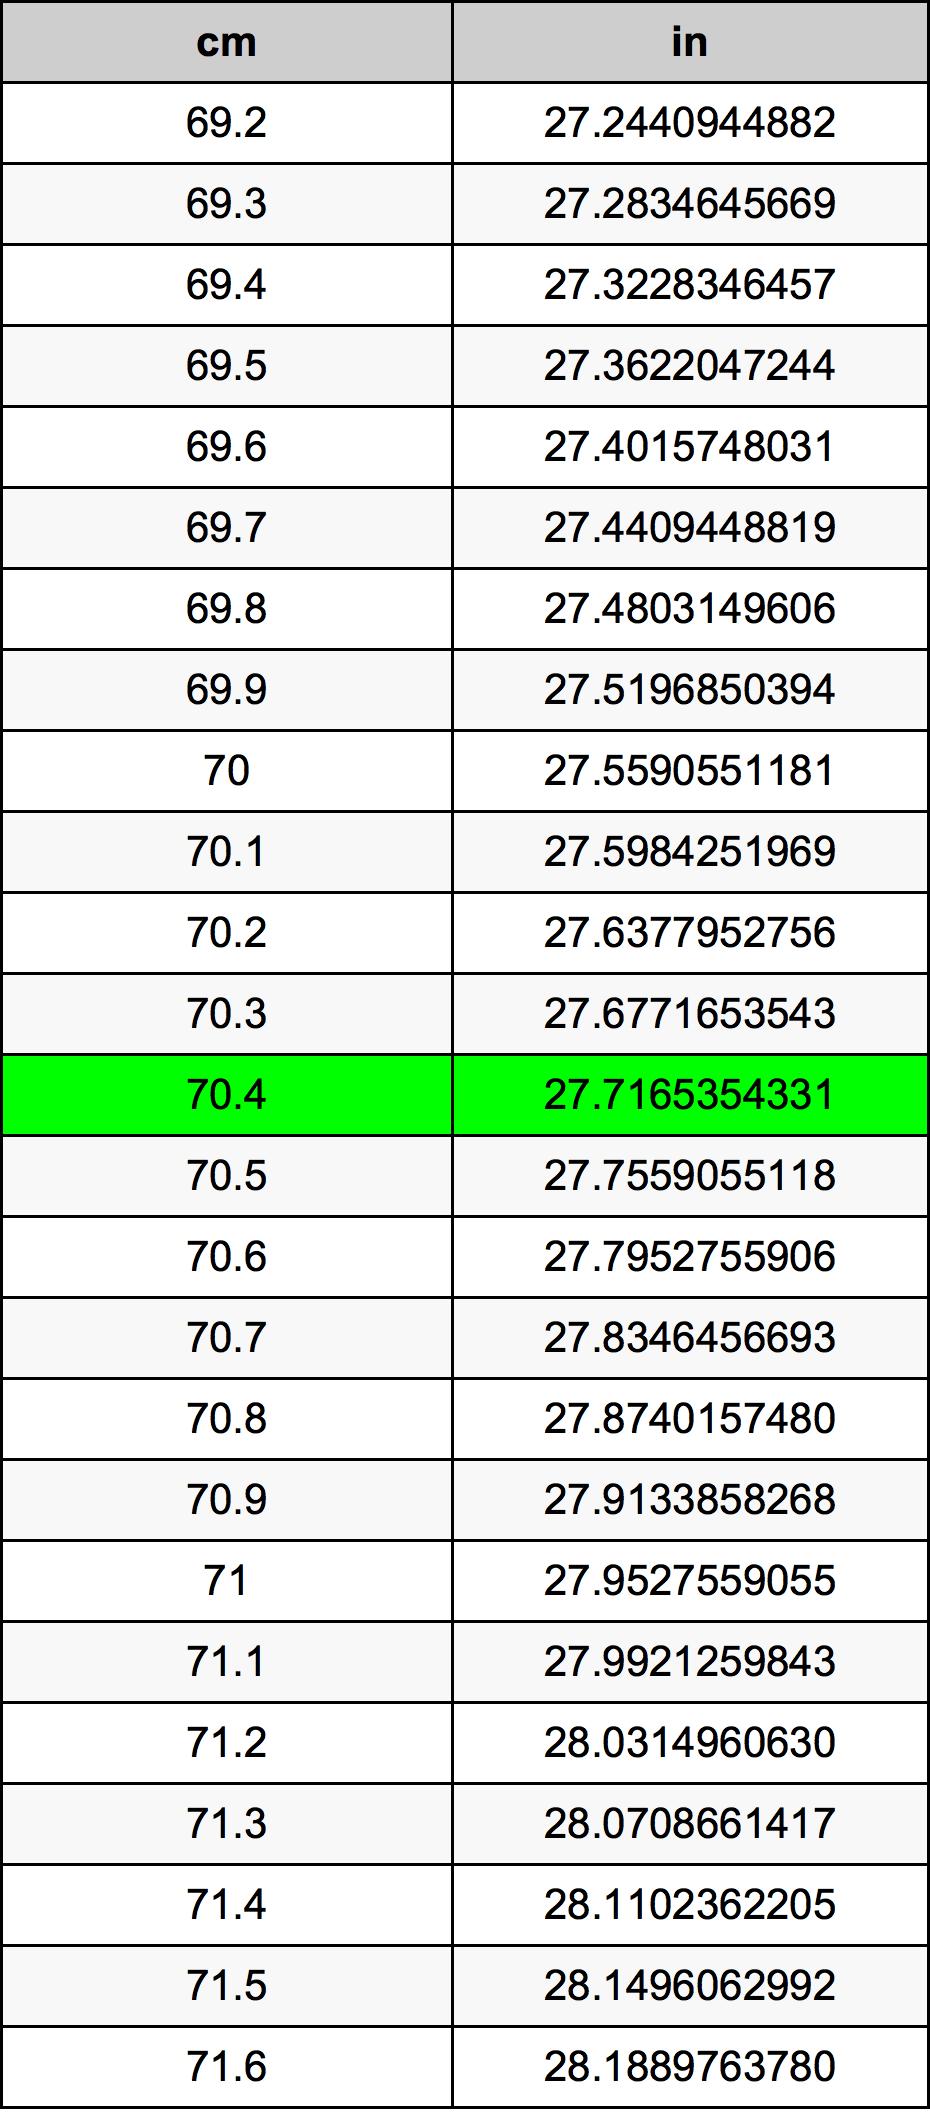 70.4 Centimeter konverteringstabellen